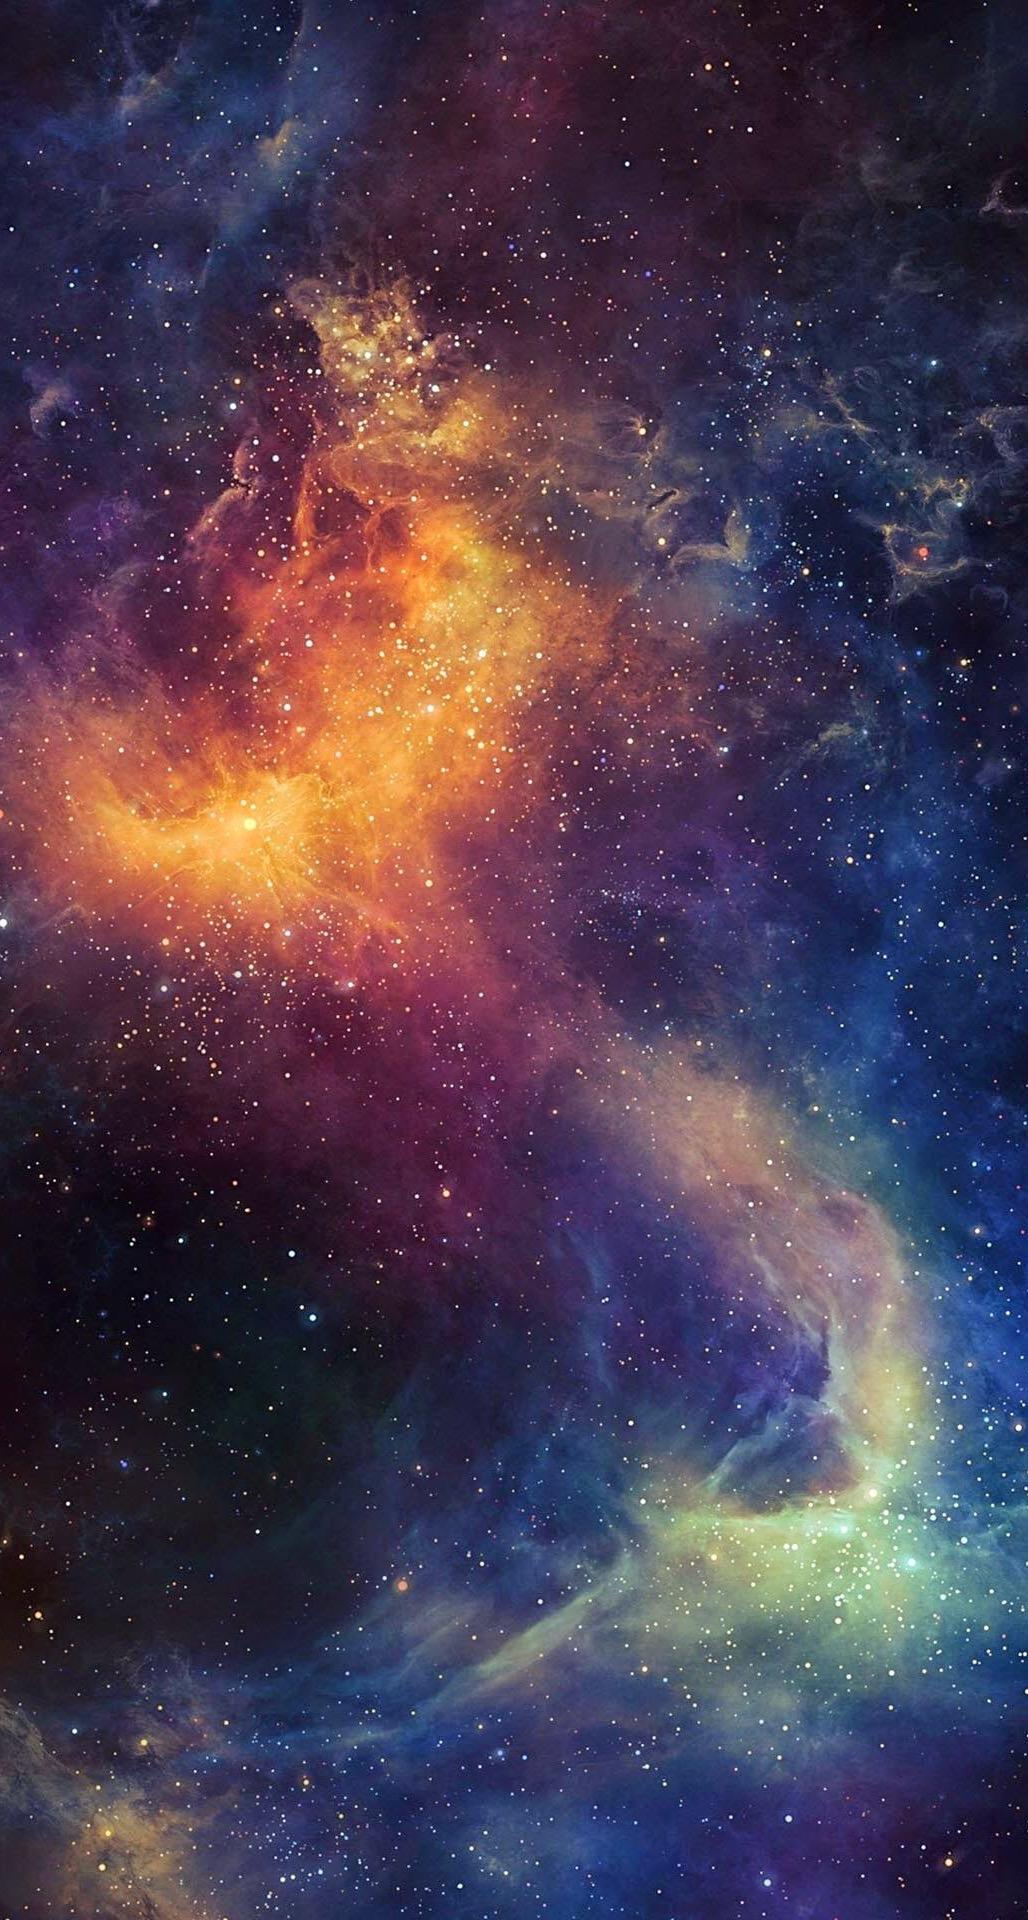 Starry Fall Night Wallpaper Free Hd Space Iphone Wallpapers Pixelstalk Net